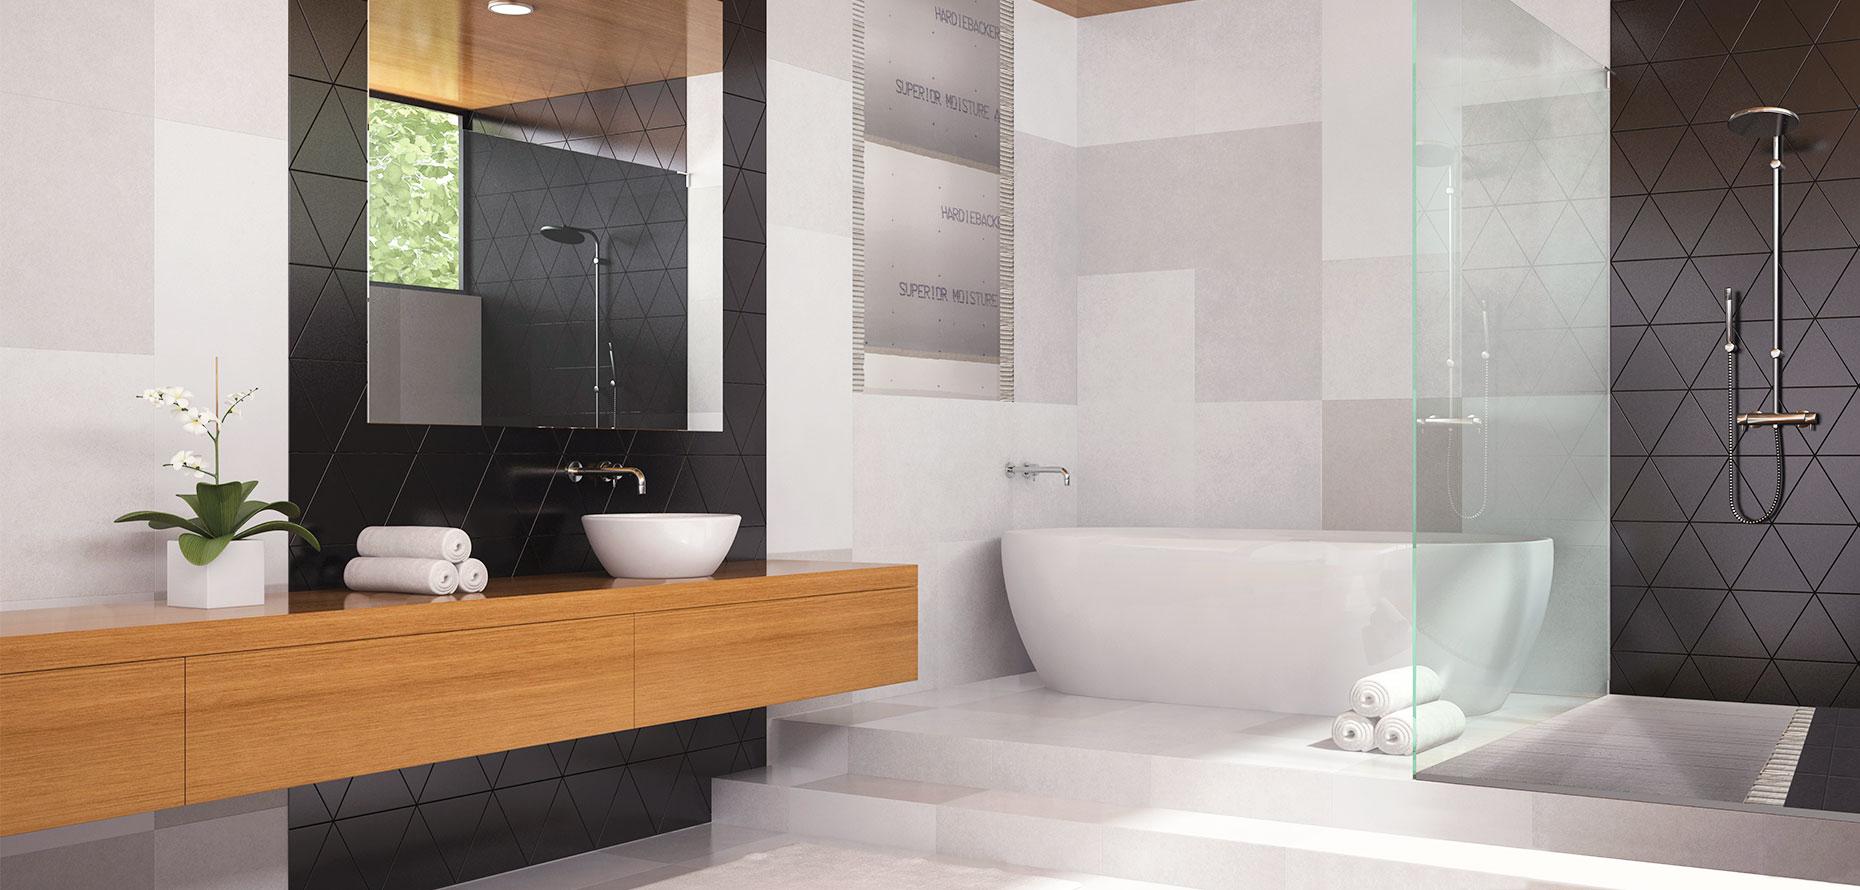 tile backer board hardiebacker cement board james hardie. Black Bedroom Furniture Sets. Home Design Ideas